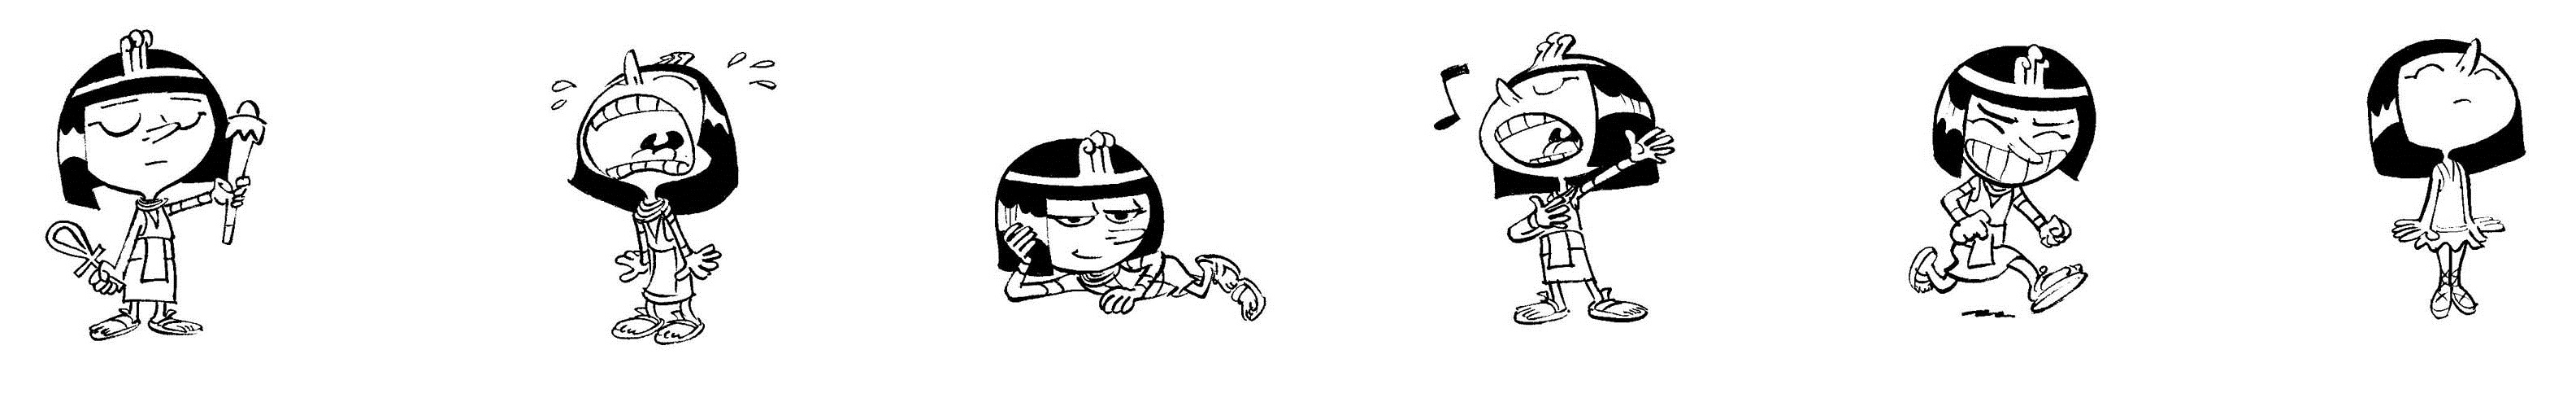 Cléo la petite pharaonne, pictogrammes 2